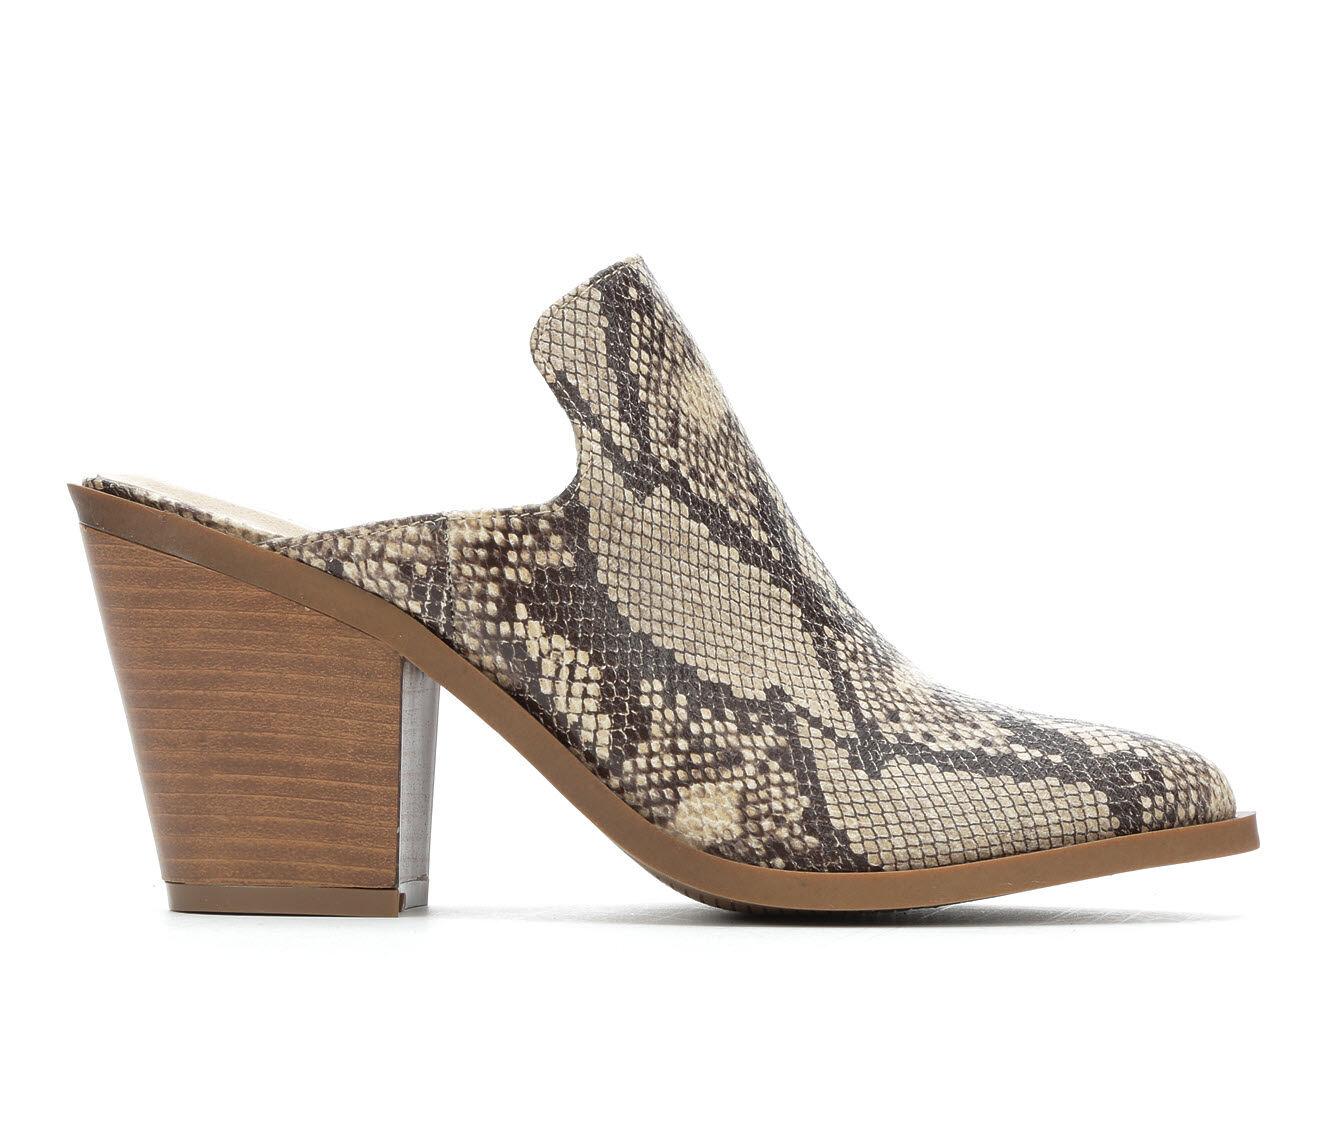 uk shoes_kd6205